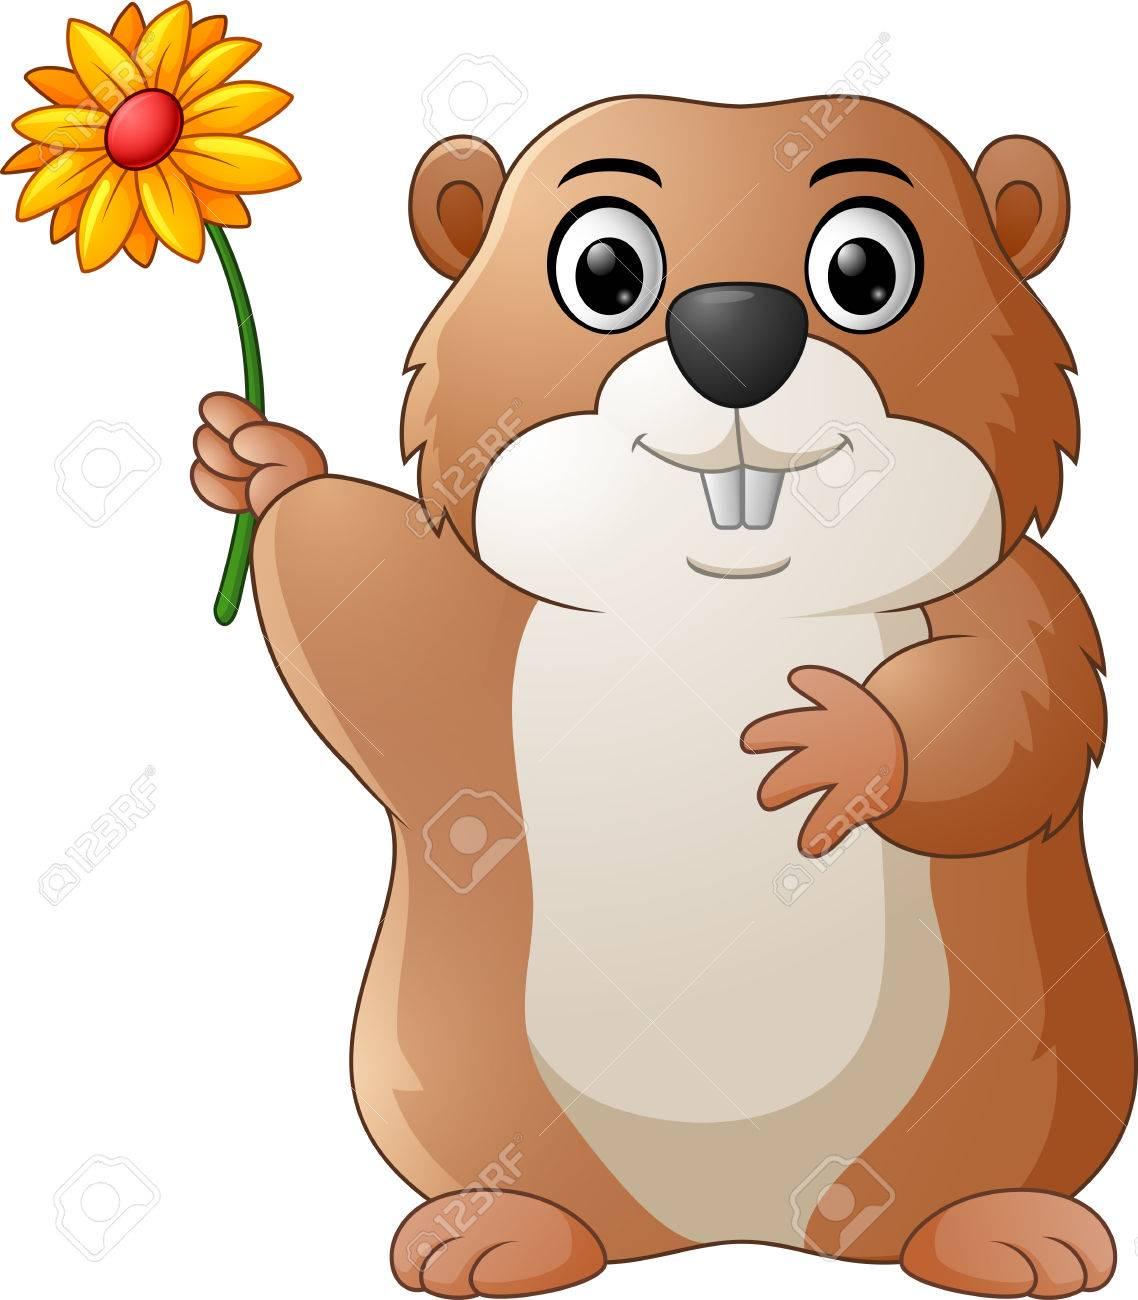 Cartoon Groundhog Pictures Free Download Clip Art.